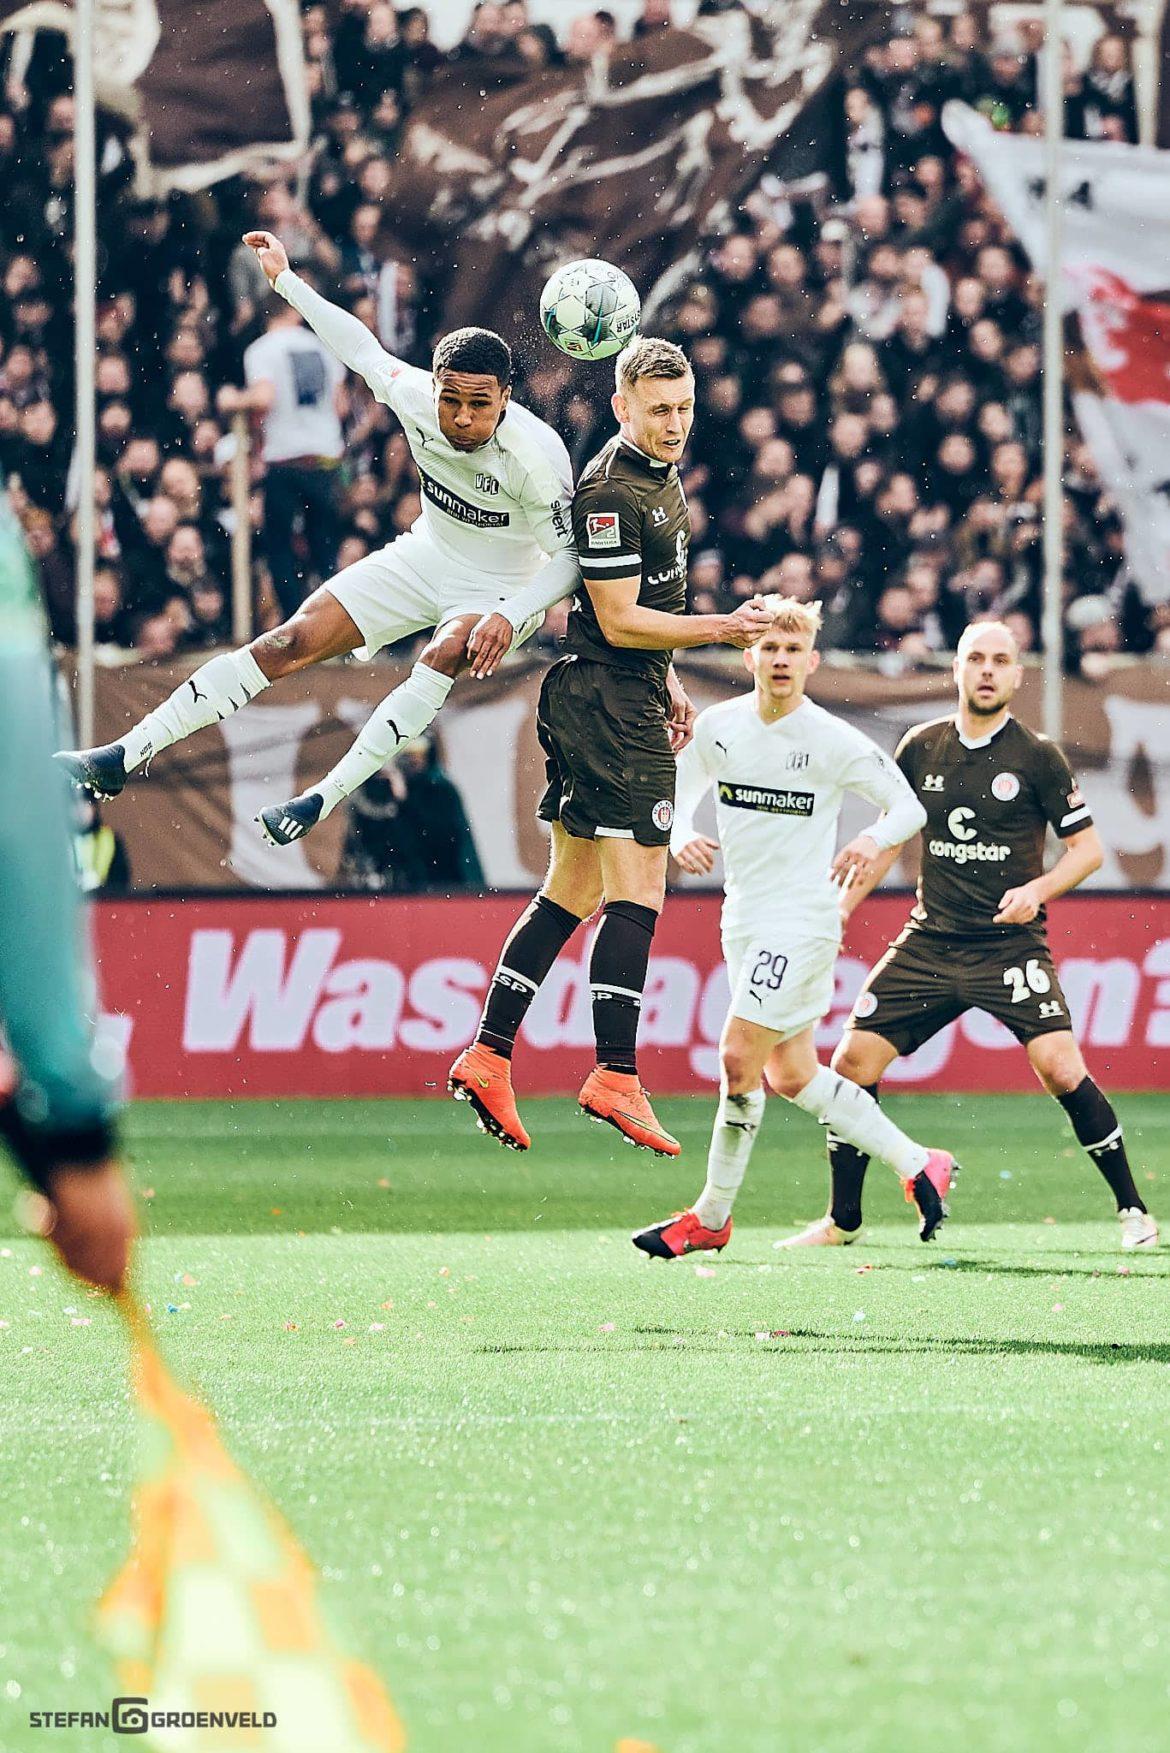 Vor dem Spiel – VfL Osnabrück (A) – Spieltag 26 – Saison 2020/21